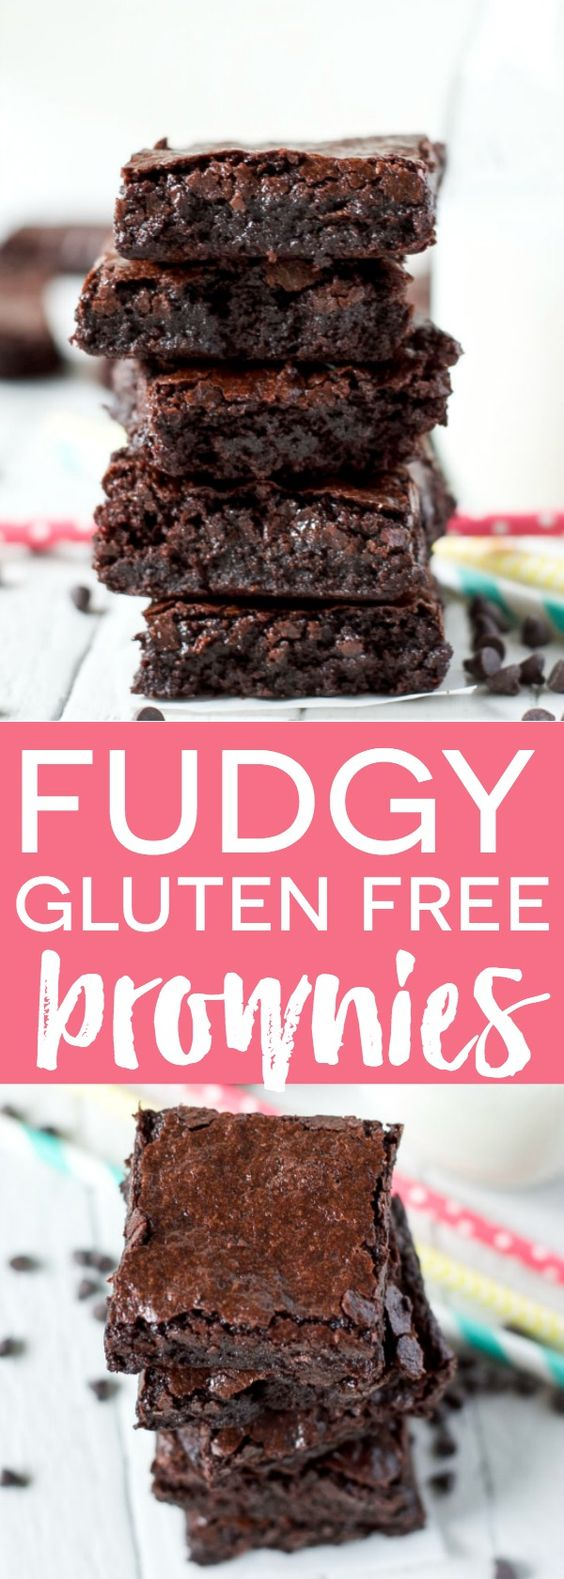 Gluten free brownies, Gluten free and Gluten on Pinterest